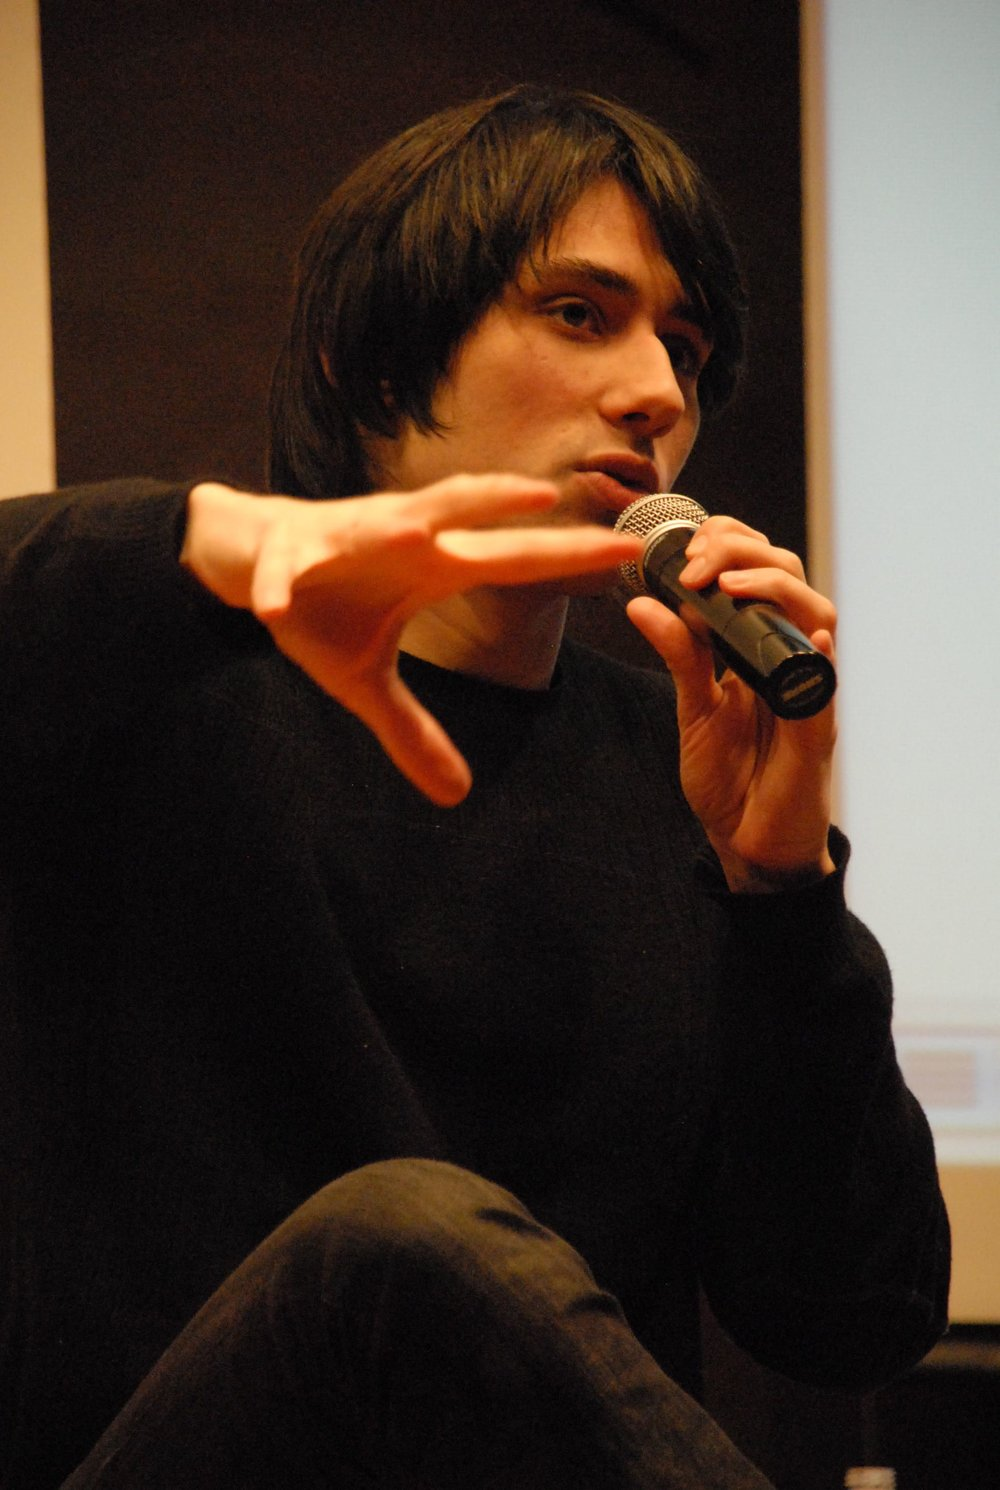 Joseph Keckler, February 1, 2011, photograph by Maleeha El Sadr